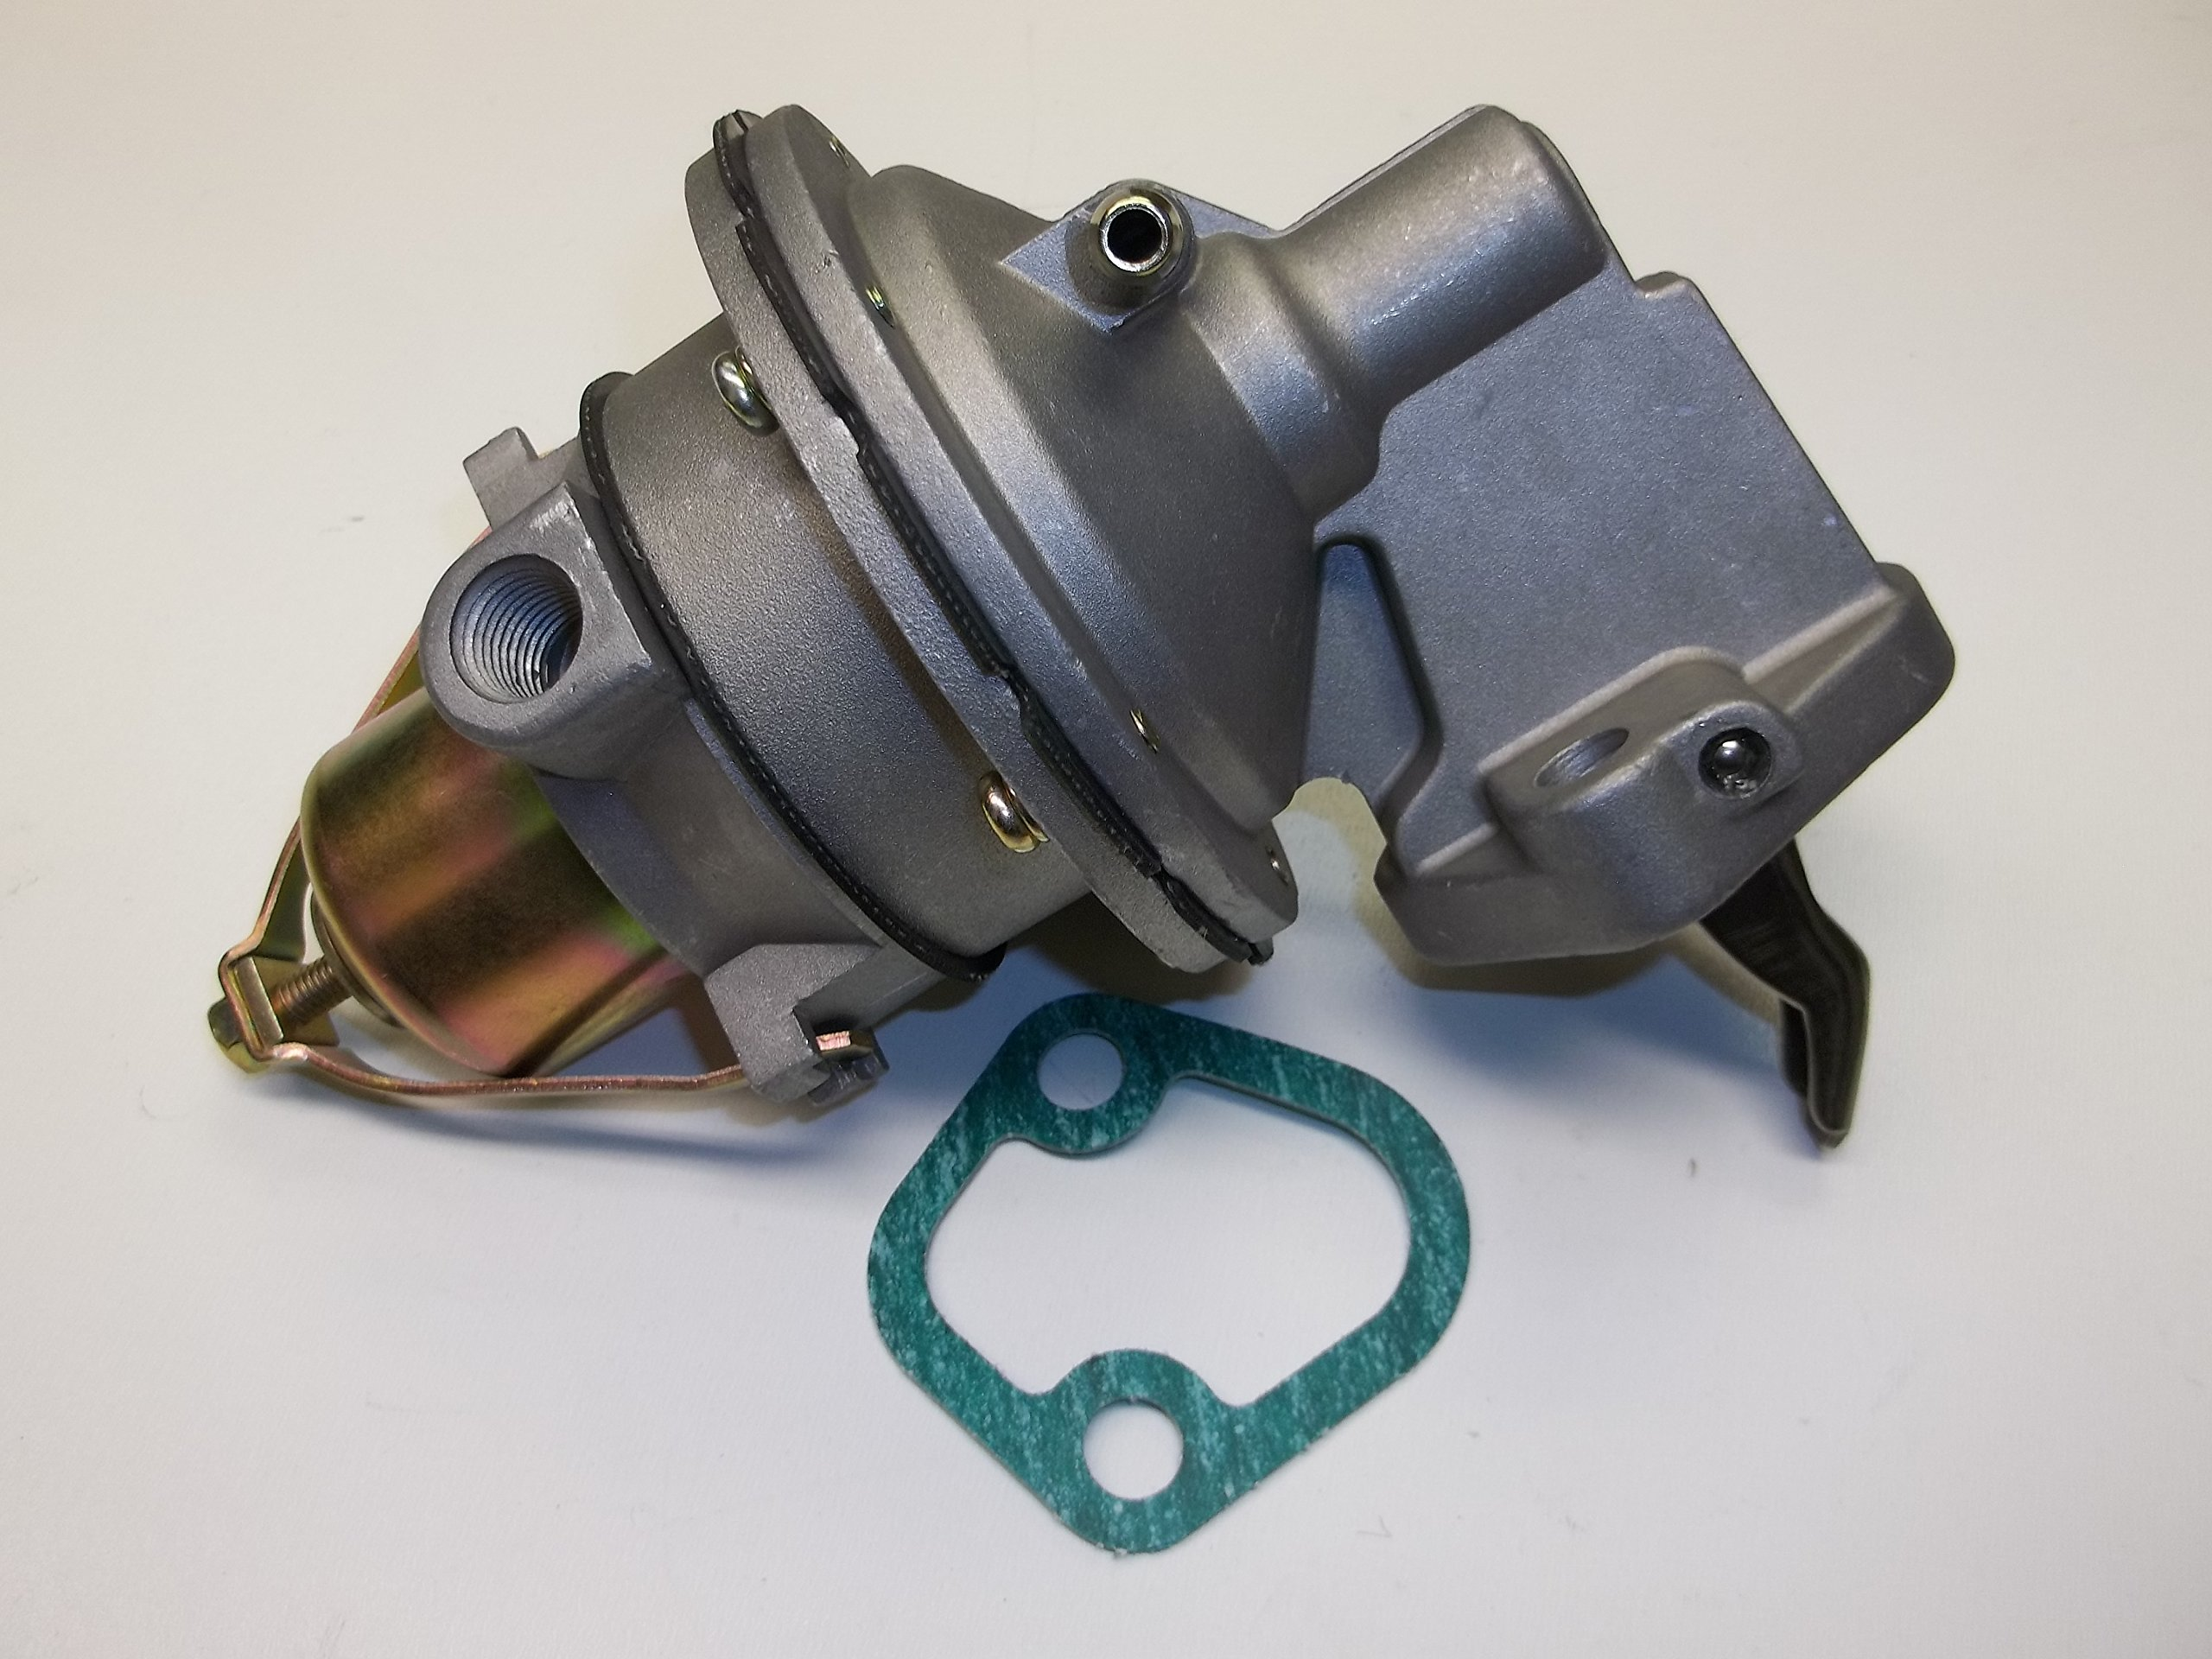 Mechanical fuel pump for Mercruiser, OMC, Volvo Penta 2.5, 3.0 engines